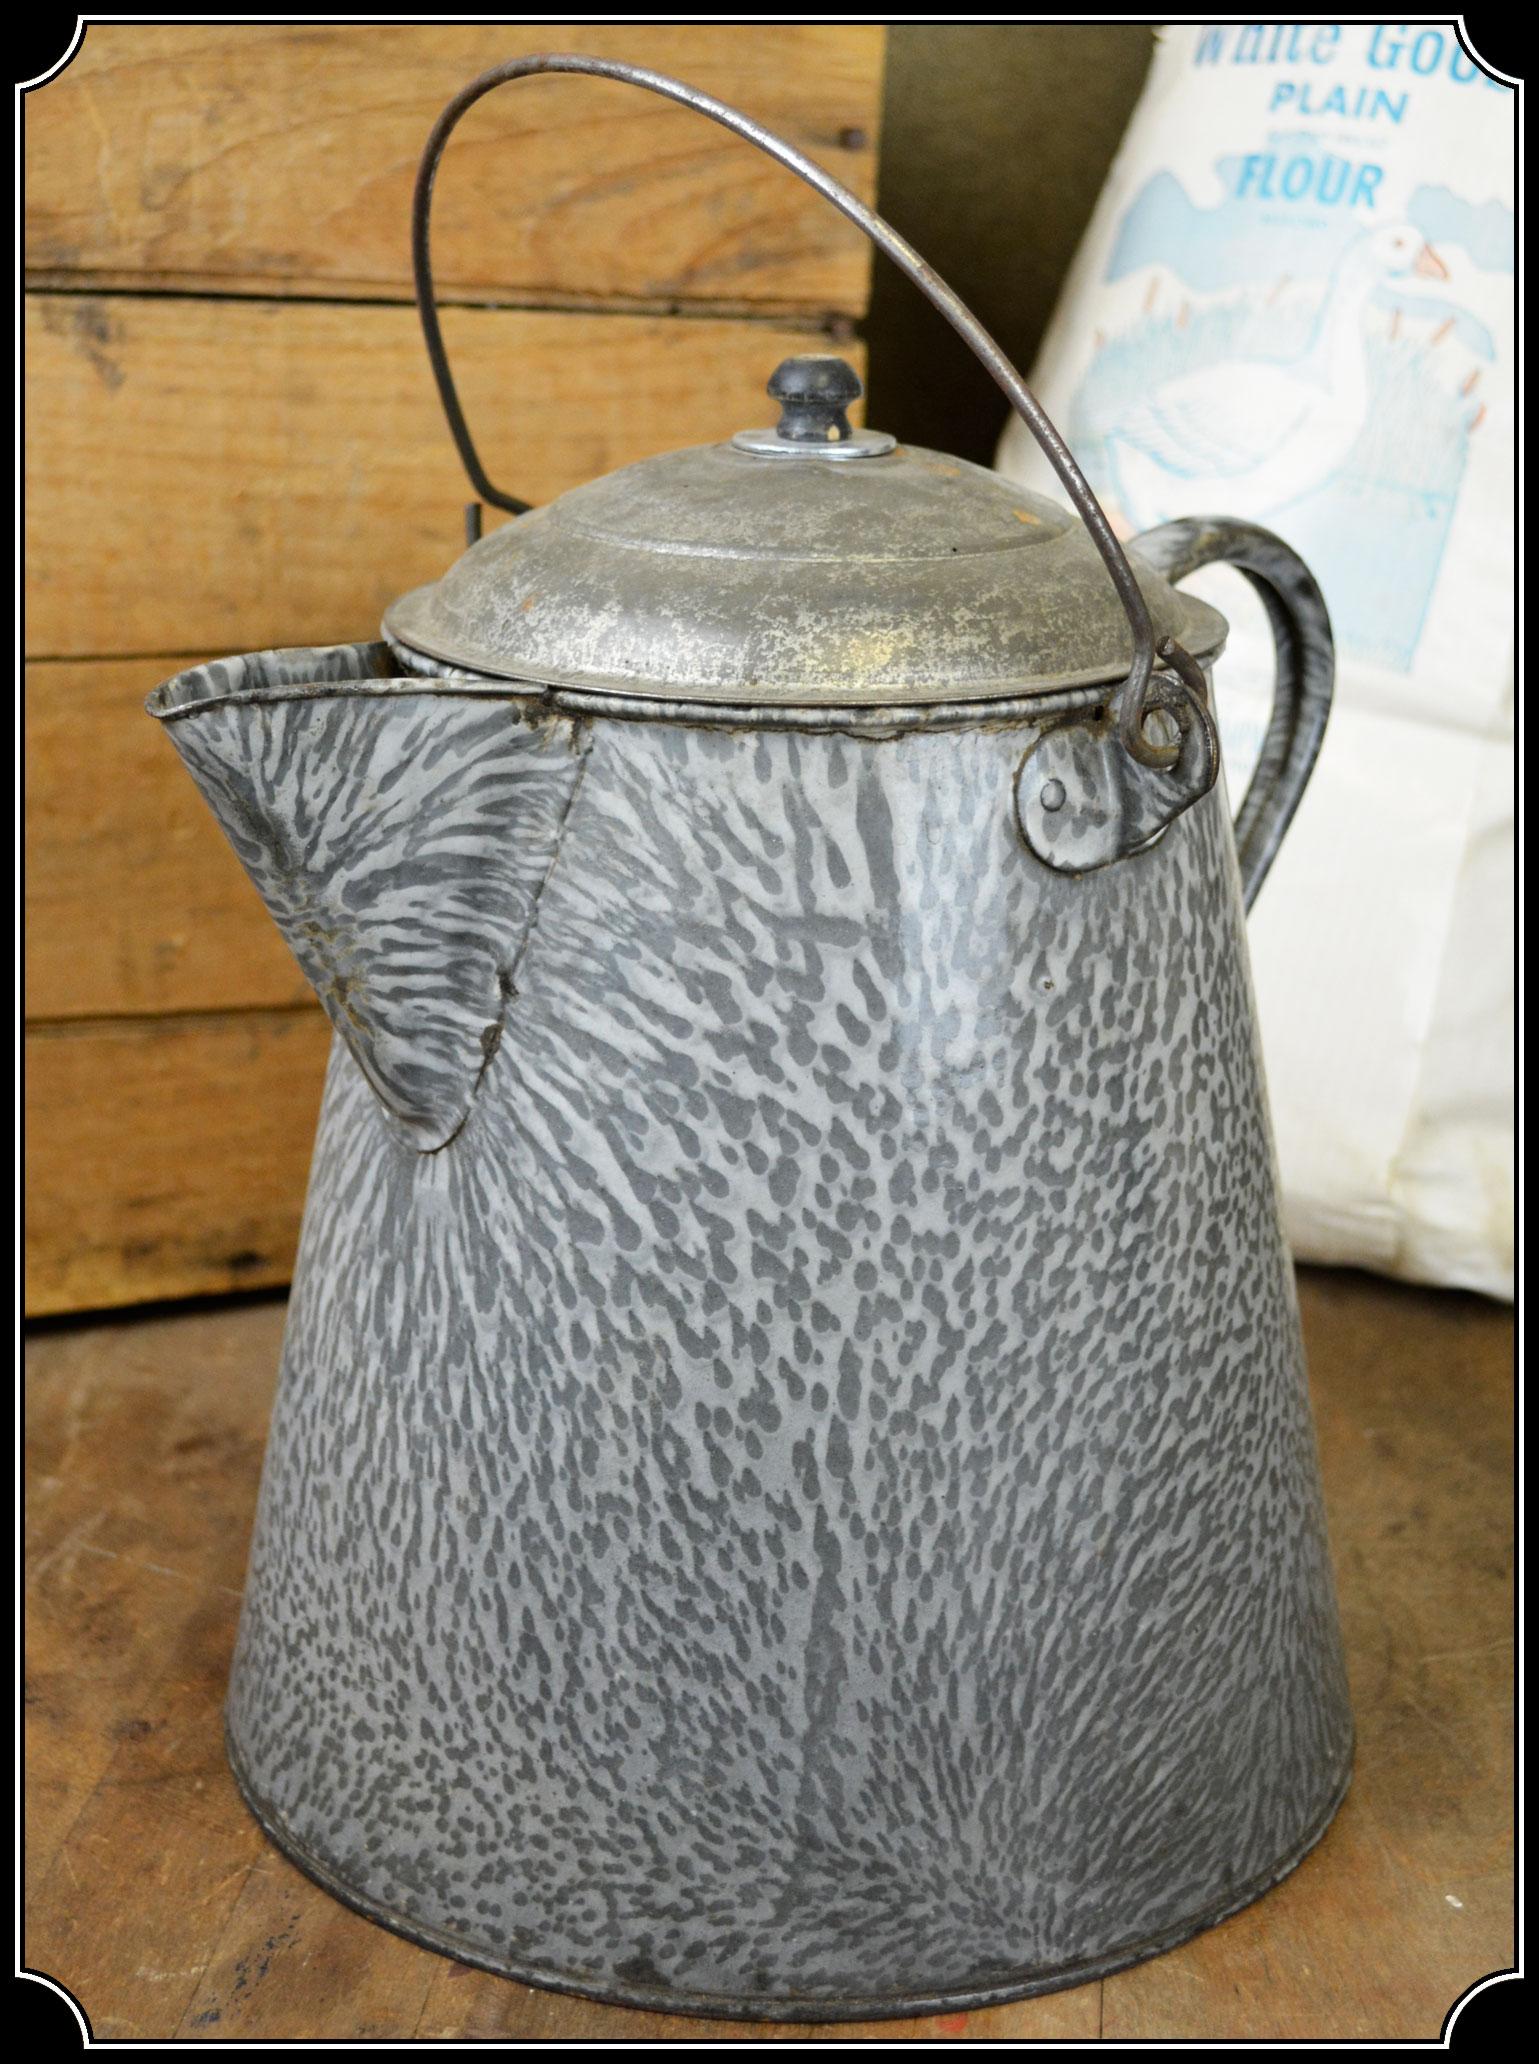 Cowboy Granite Enamel Coffee Pot Click To Enlarge Image